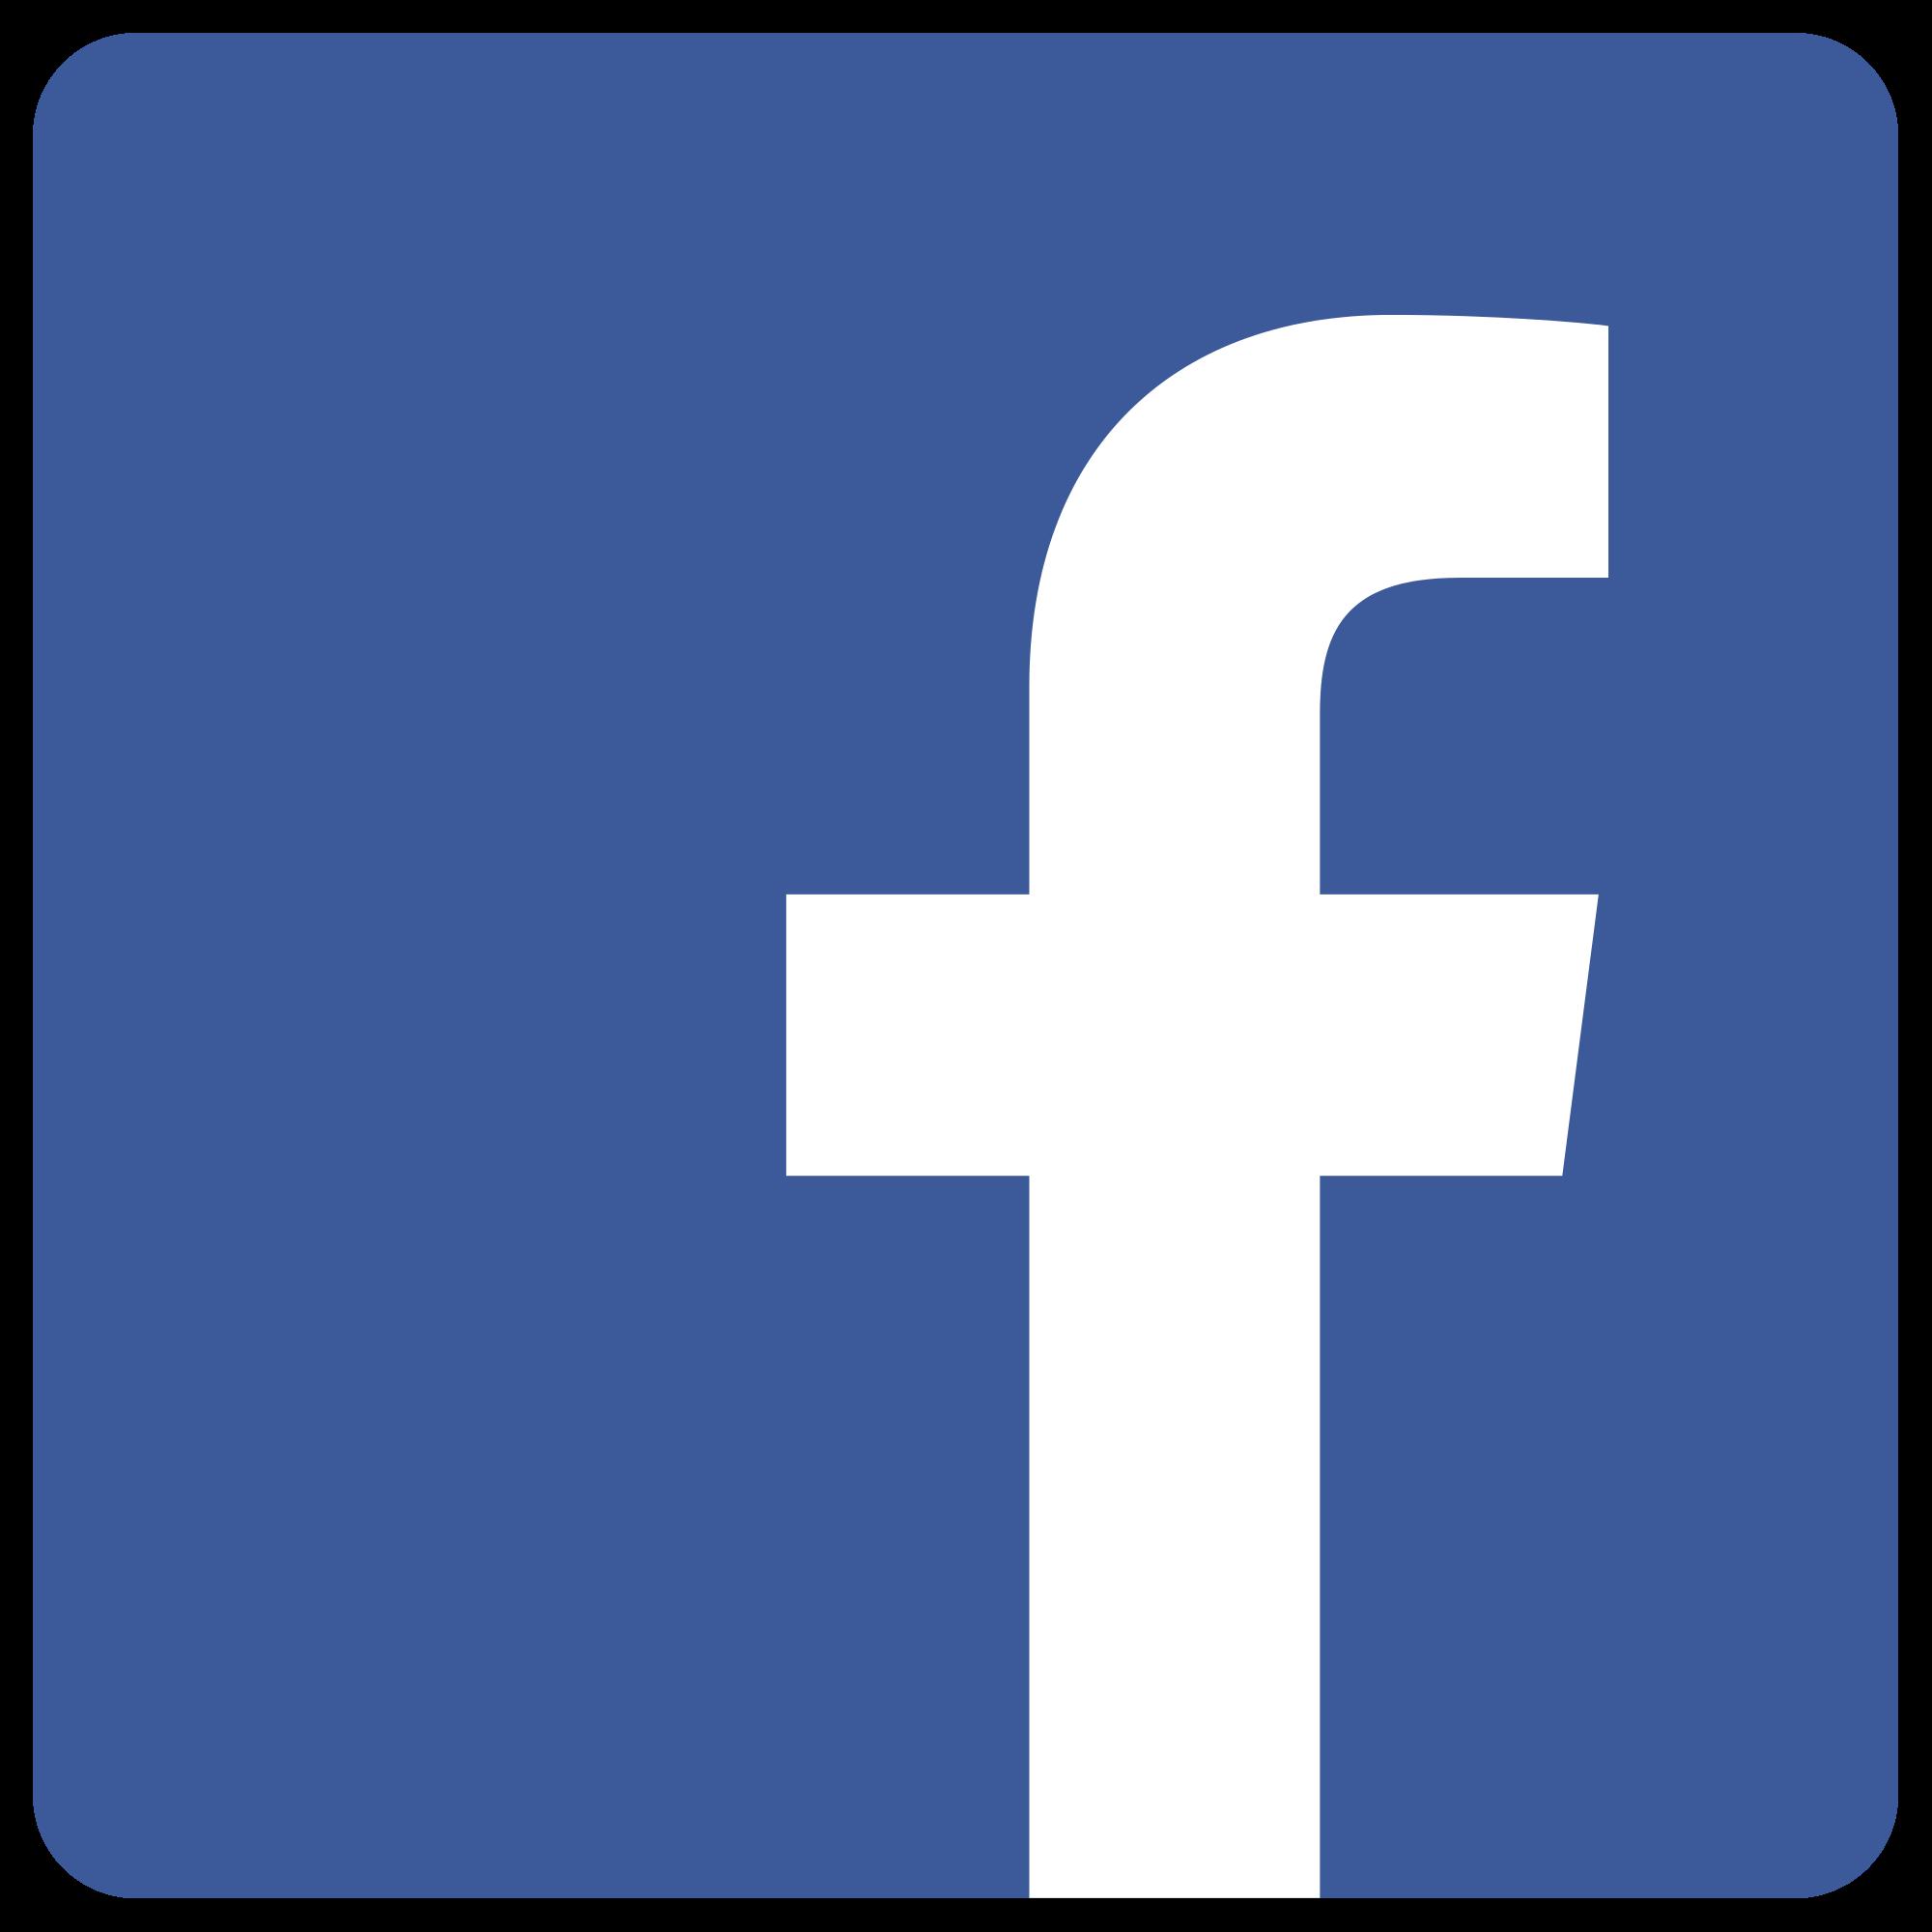 File Manager -> facebook_32.png